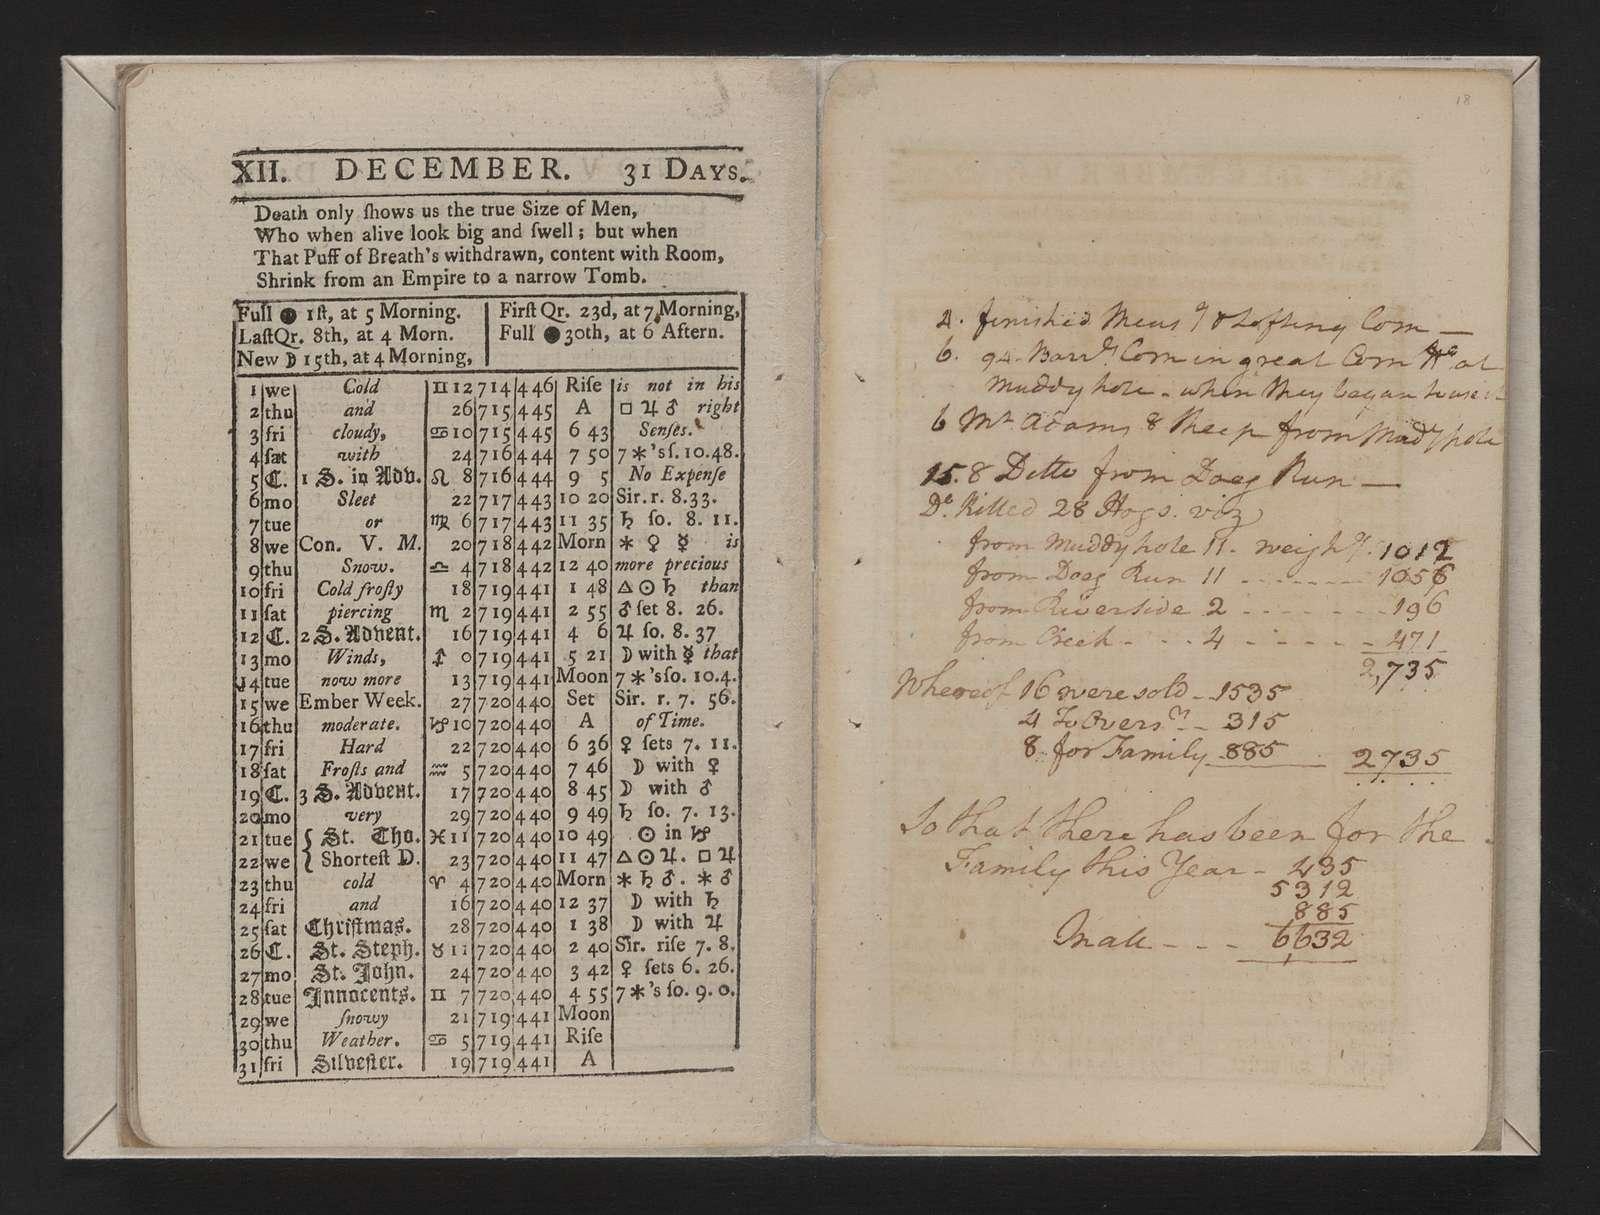 George Washington diary, 1762. Autograph manuscript written in the leaves of the 1762 Virginia Almanack.